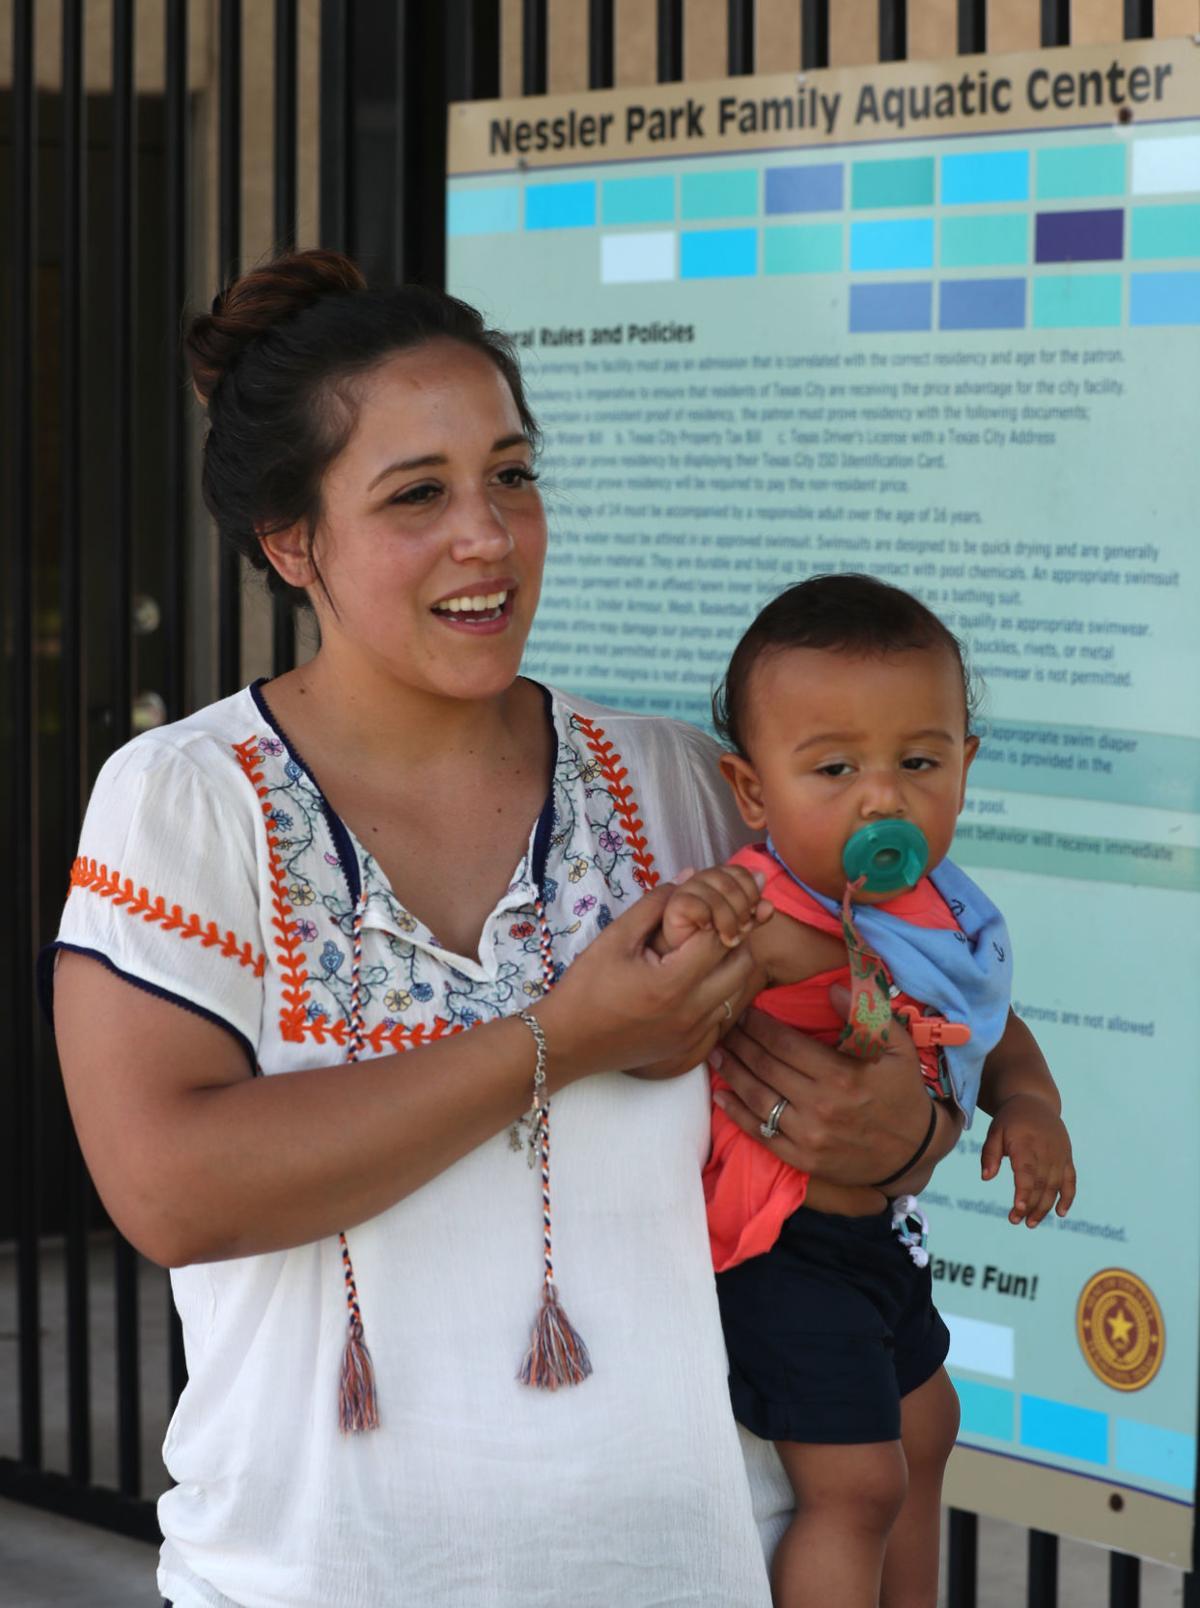 Breastfeeding protest at Texas City pool